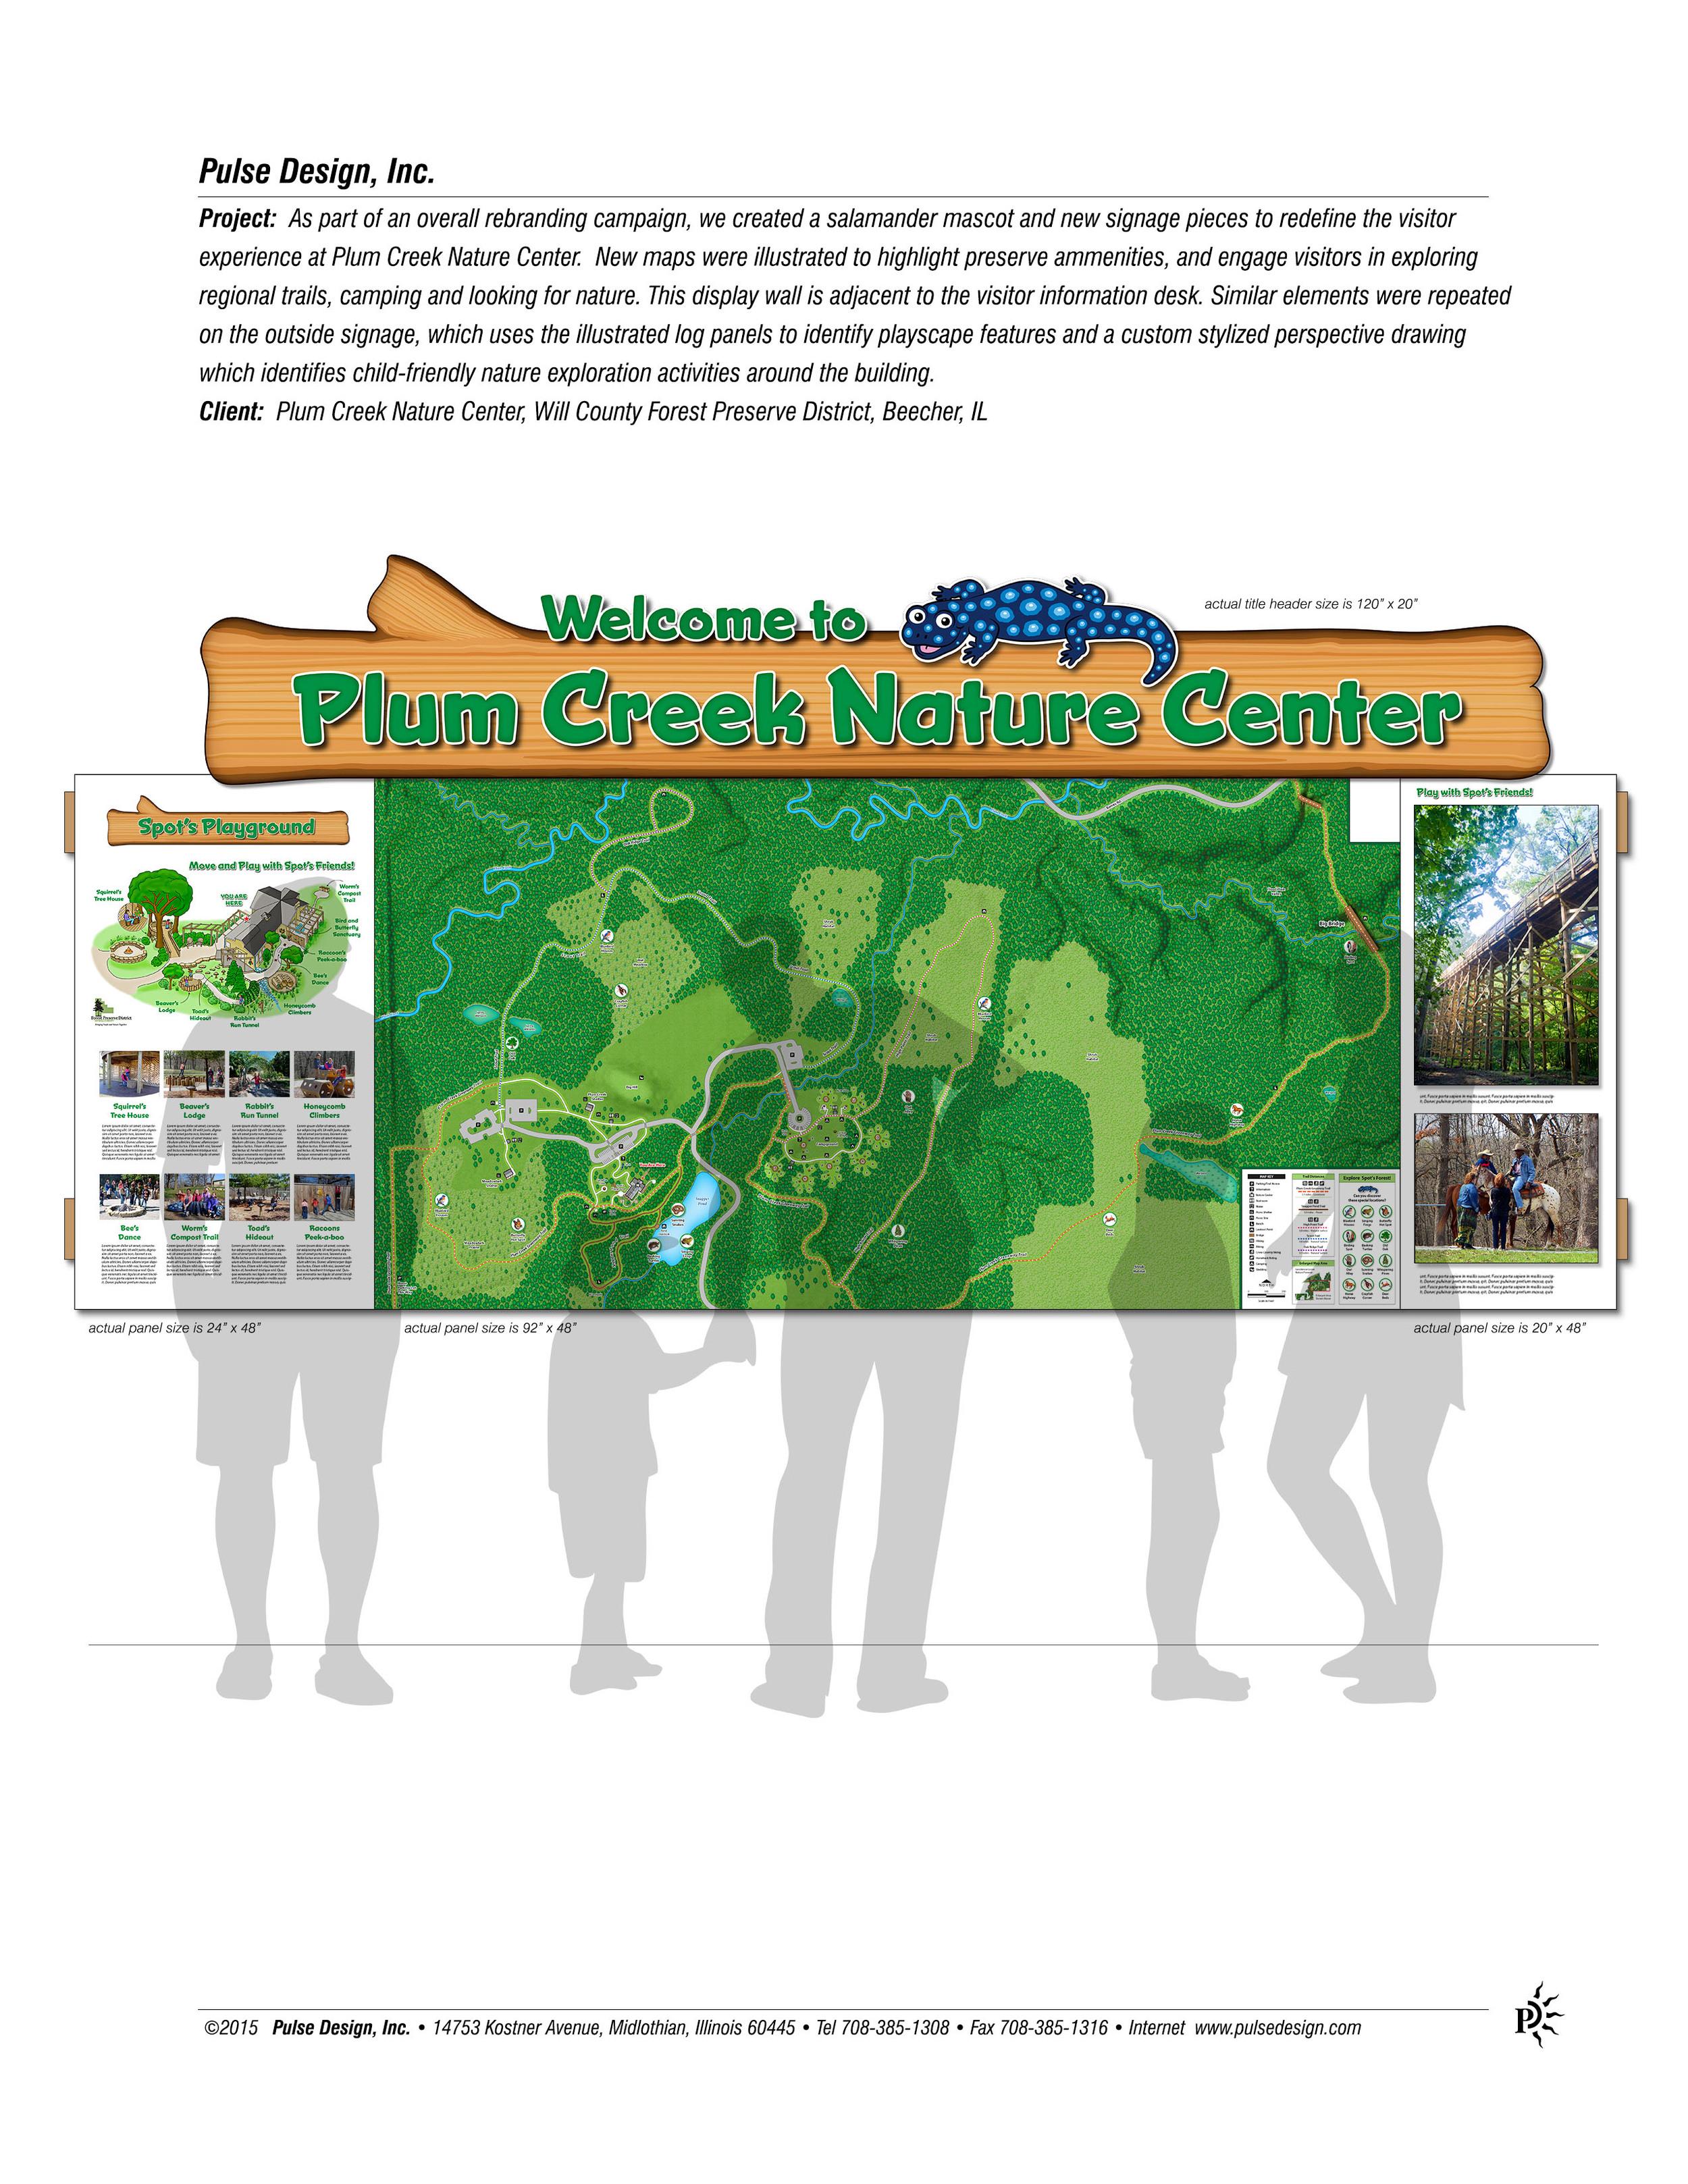 Plum-Creek-Orientation-Map-Wall-Exhibit-1-Pulse-Design-Inc.jpg